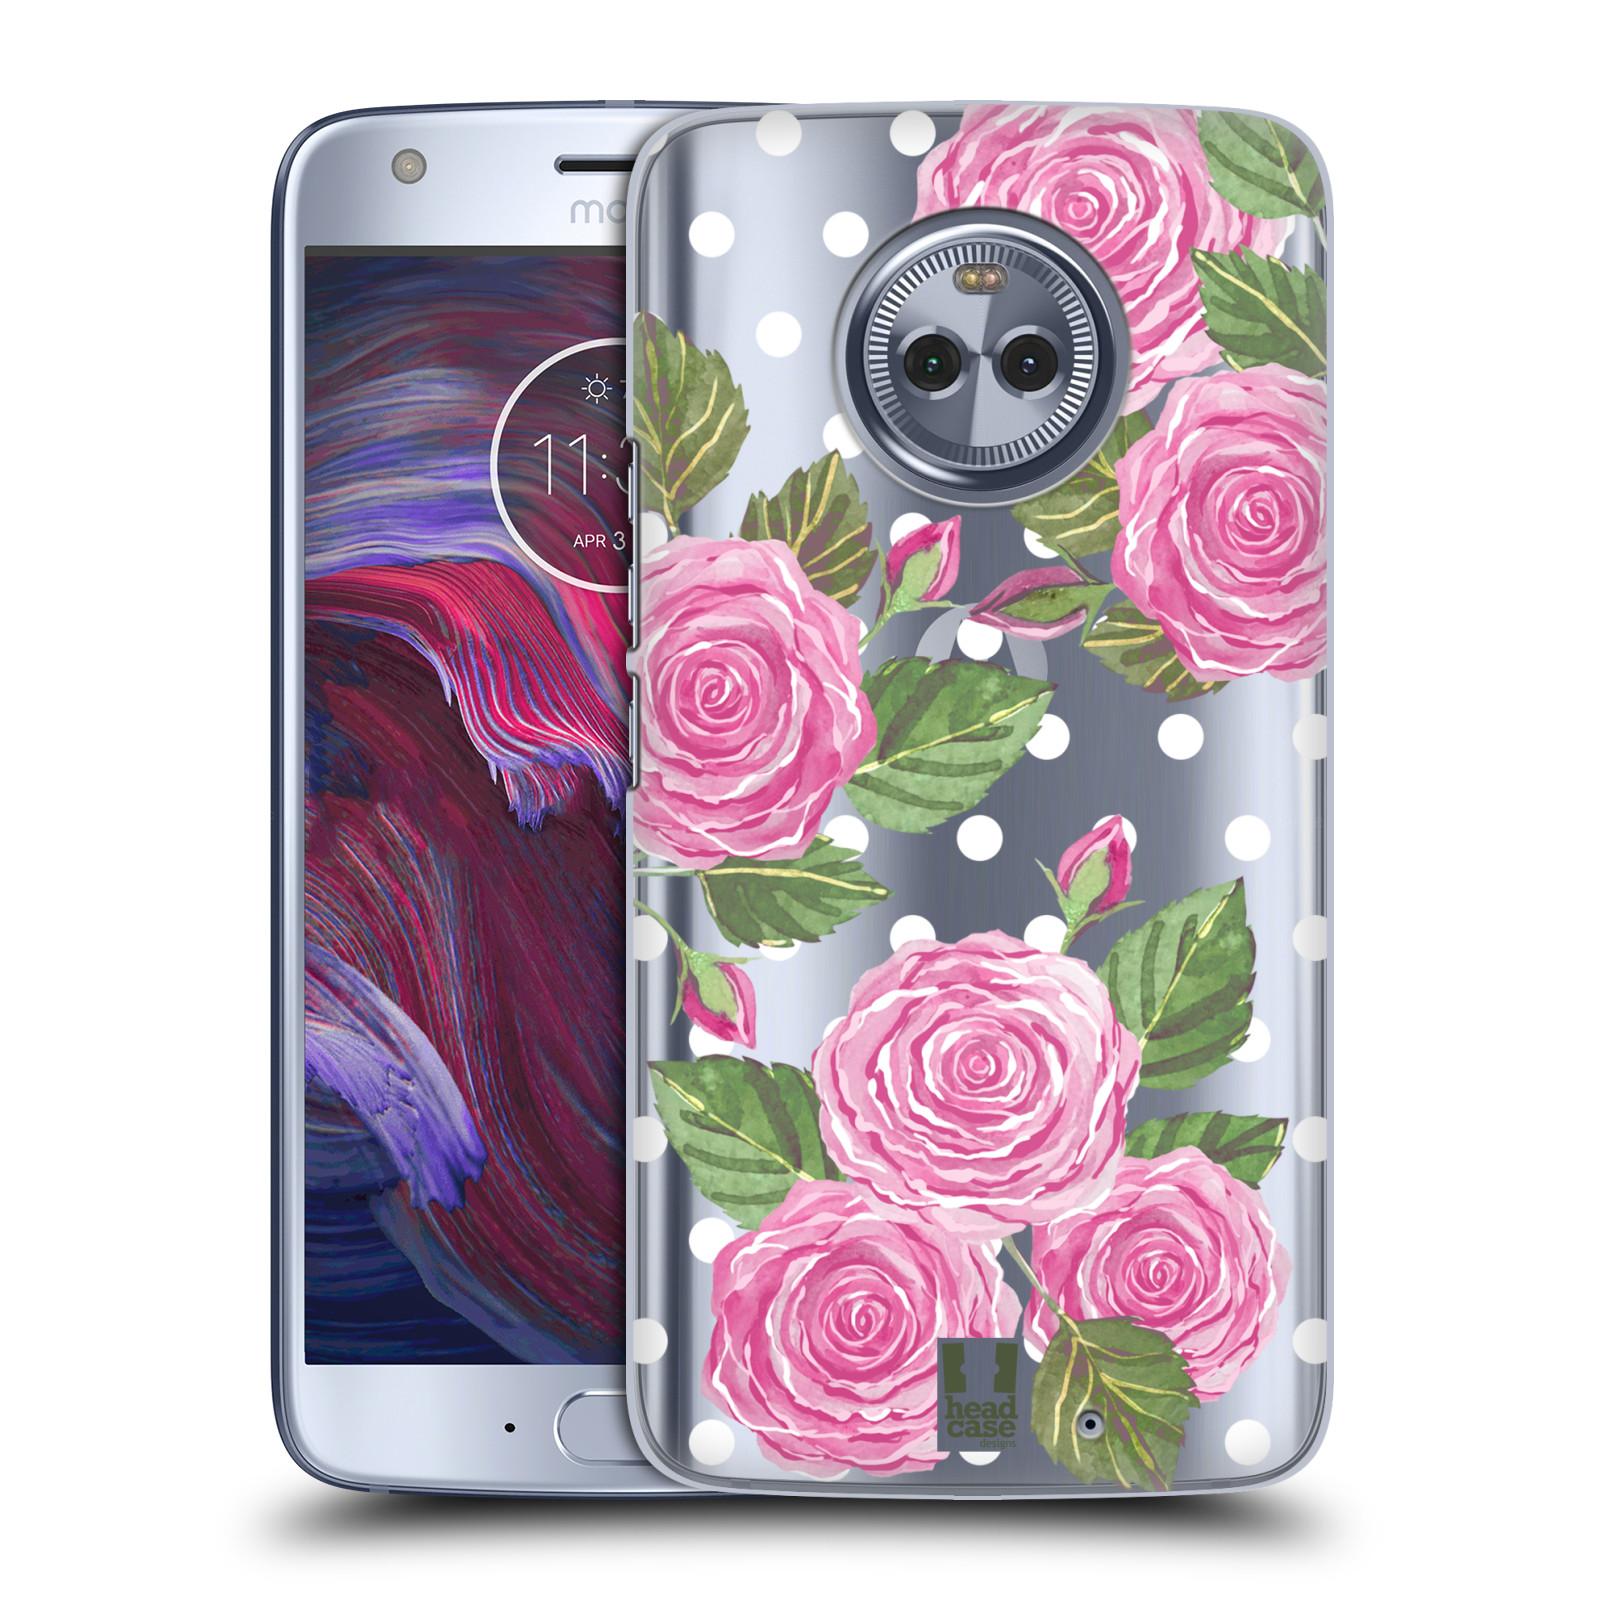 Plastové pouzdro na mobil Lenovo Moto X4 - Head Case - Hezoučké růžičky - průhledné